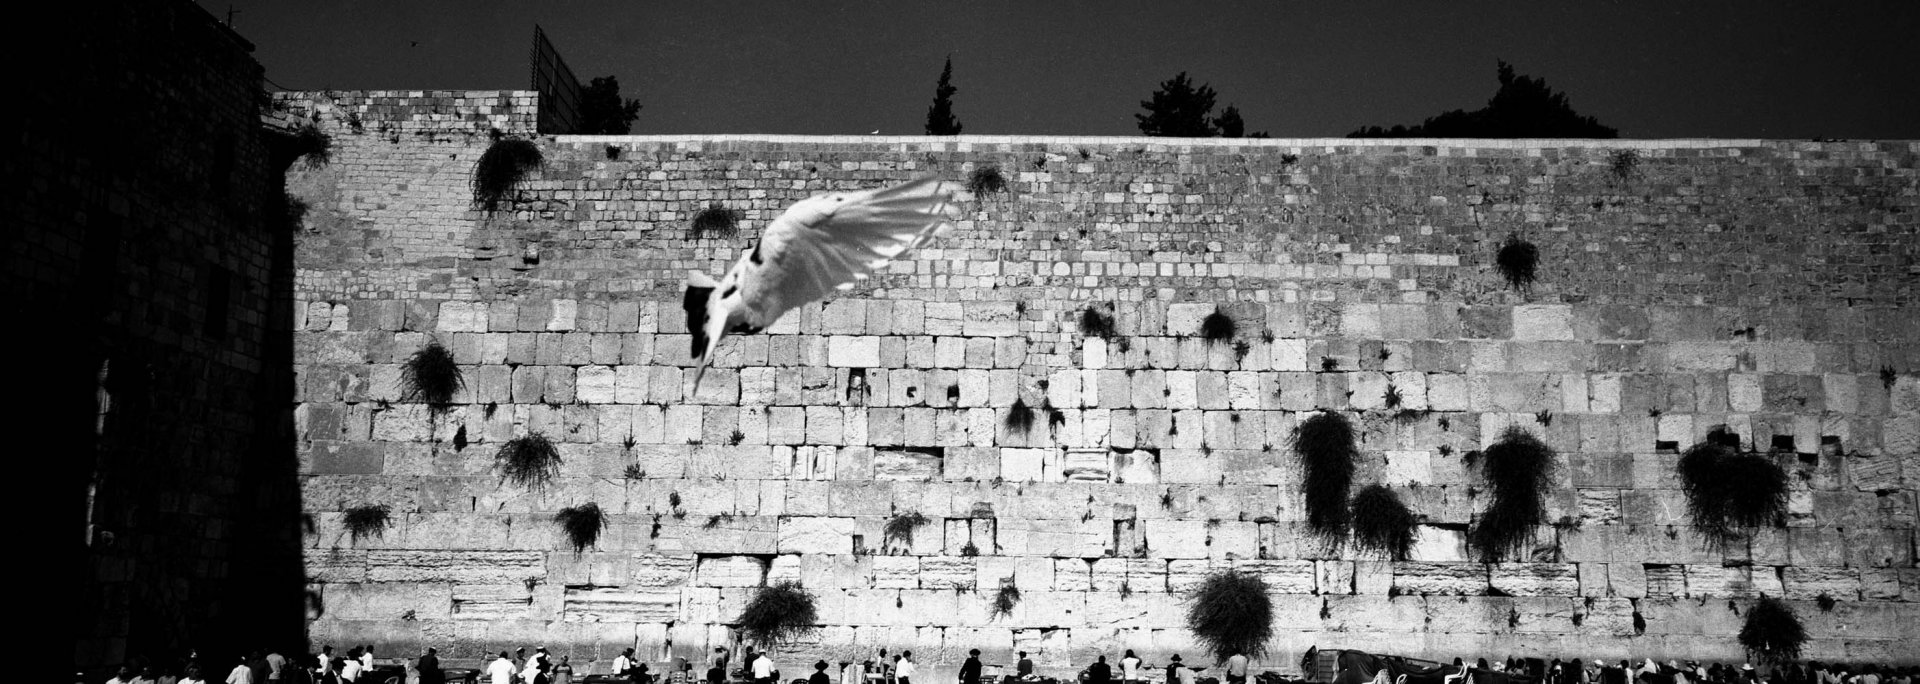 Murmure, Jérusalem 2004